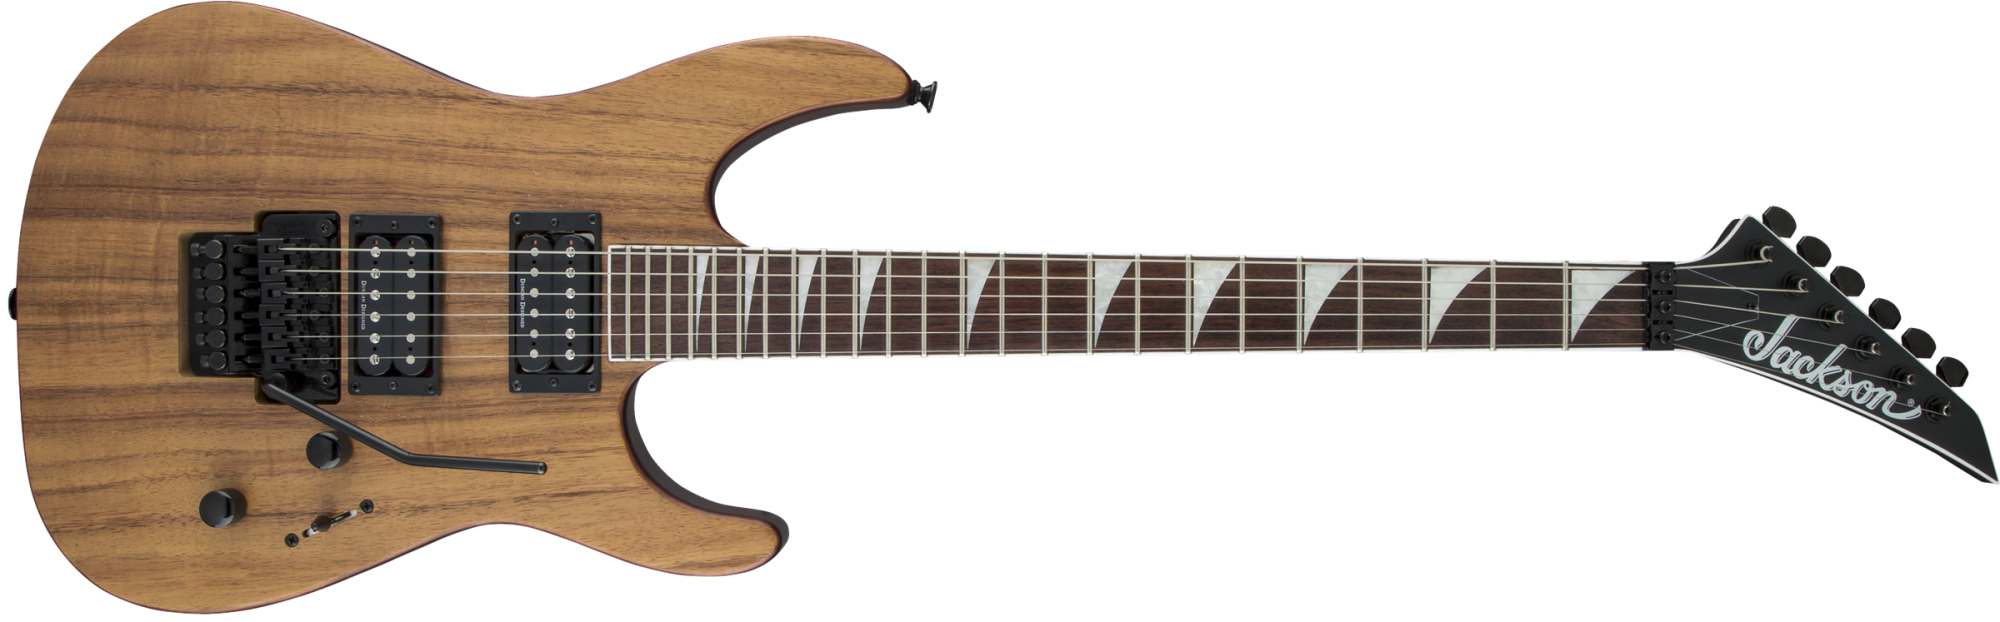 Jackson SLX X Series Soloist Electric Guitar - Koa